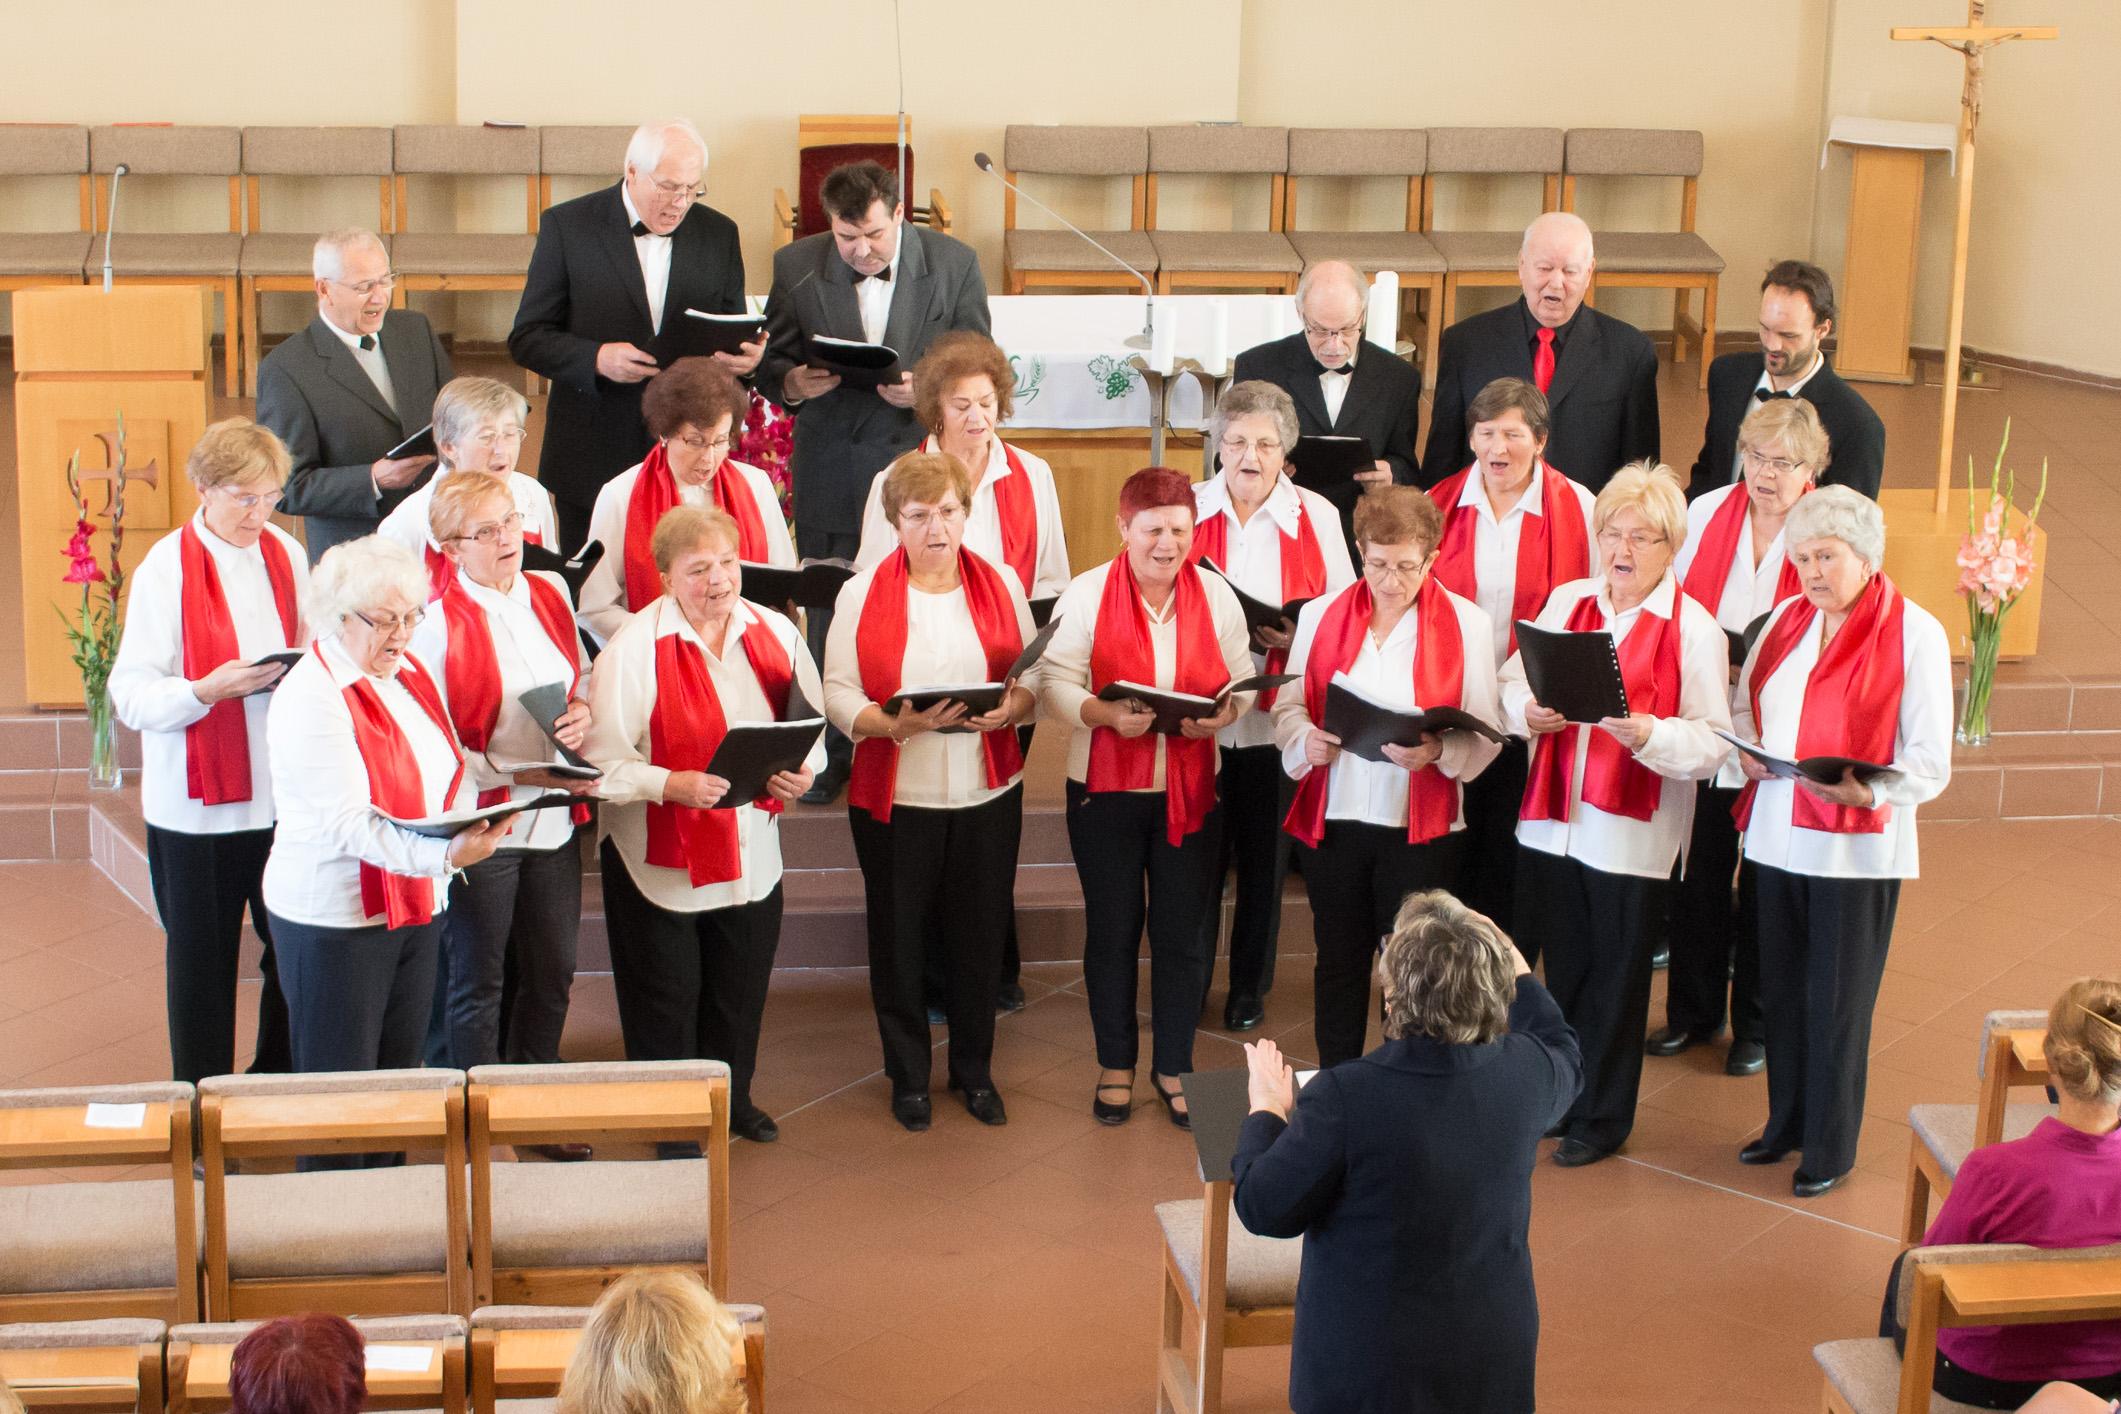 zbor-bozieho-srdca-jezisovho-sekier-2017